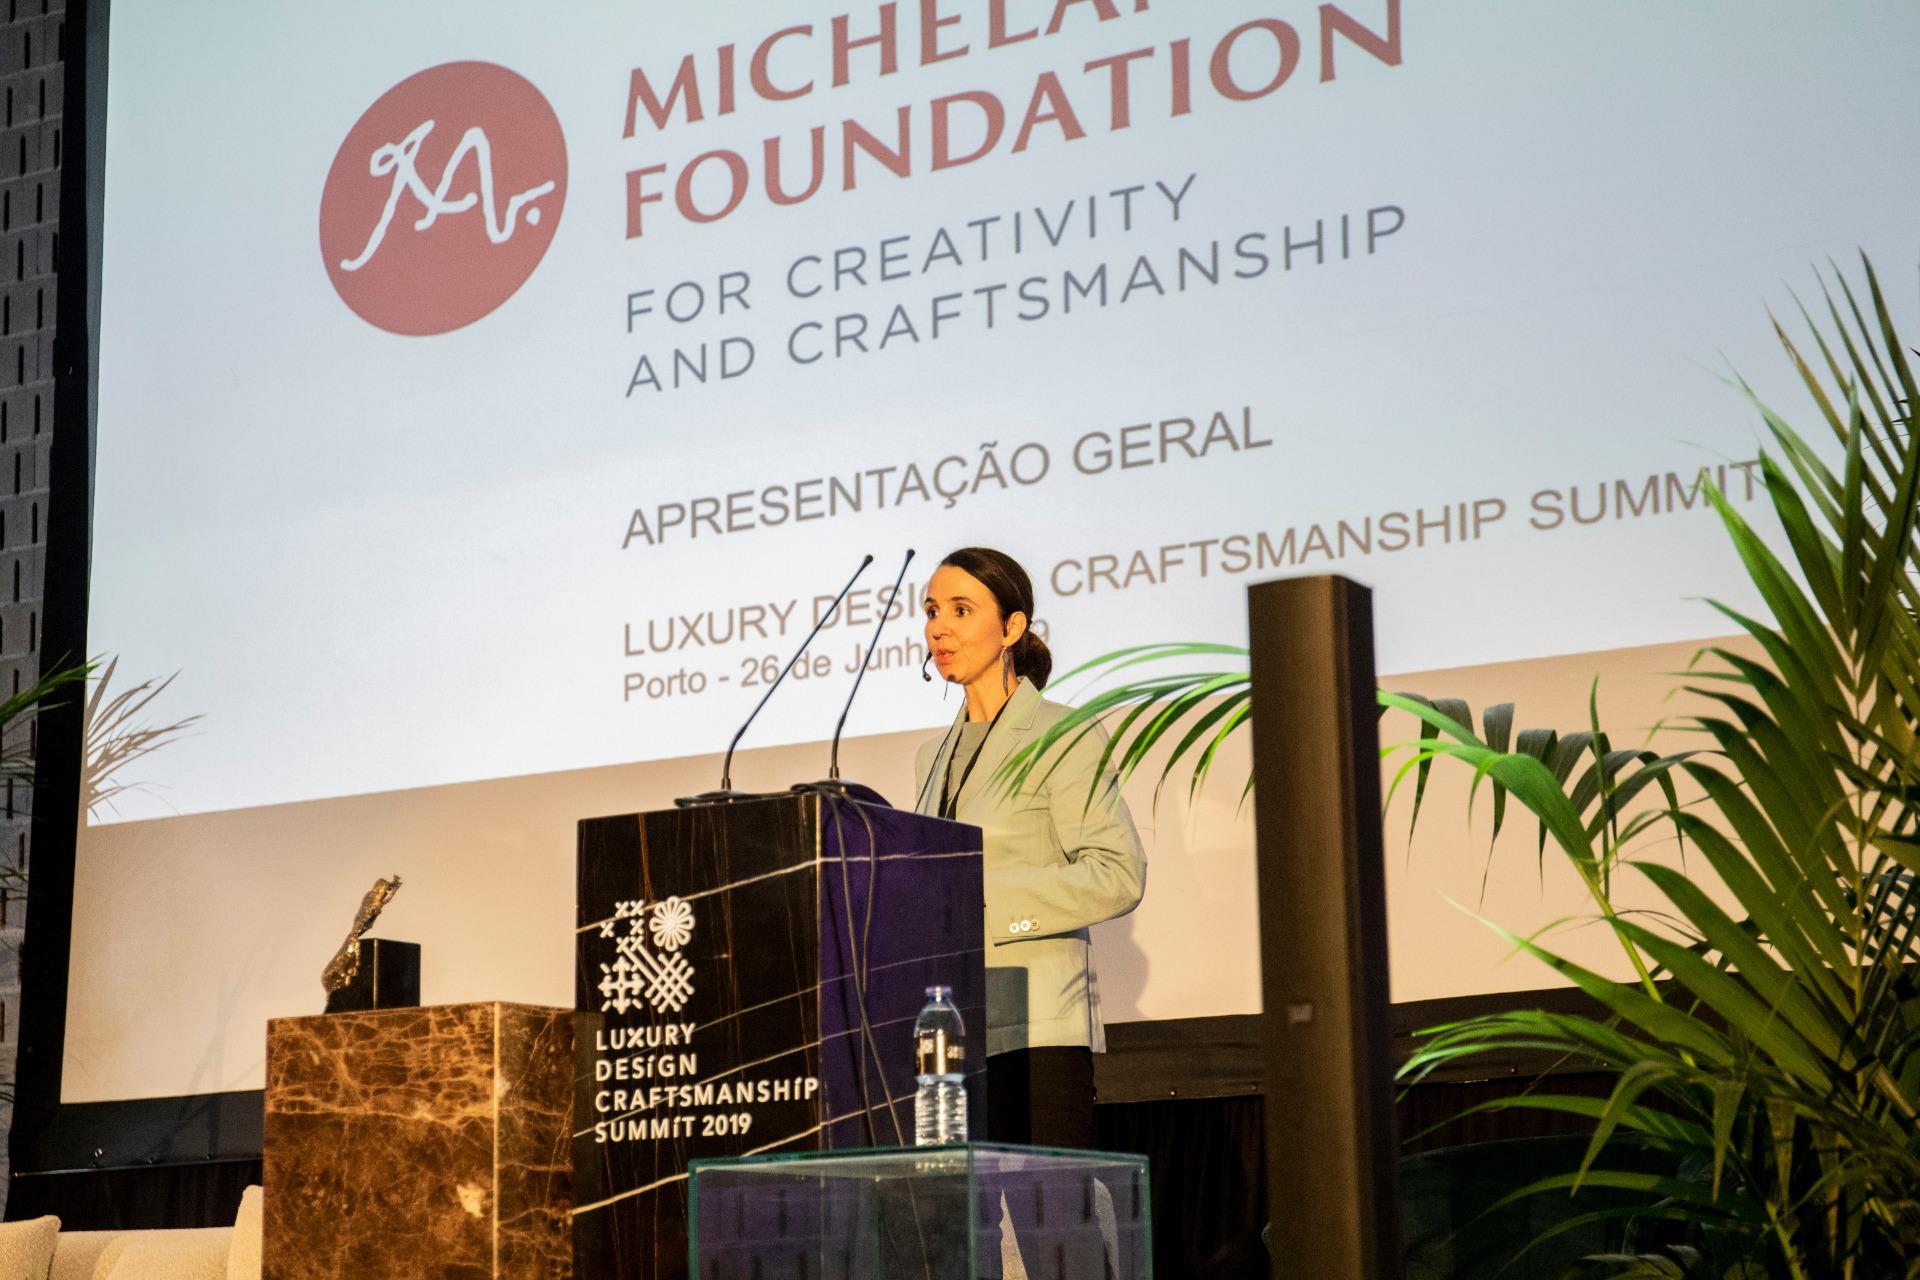 Luxury Design and Craftsmanship Summit